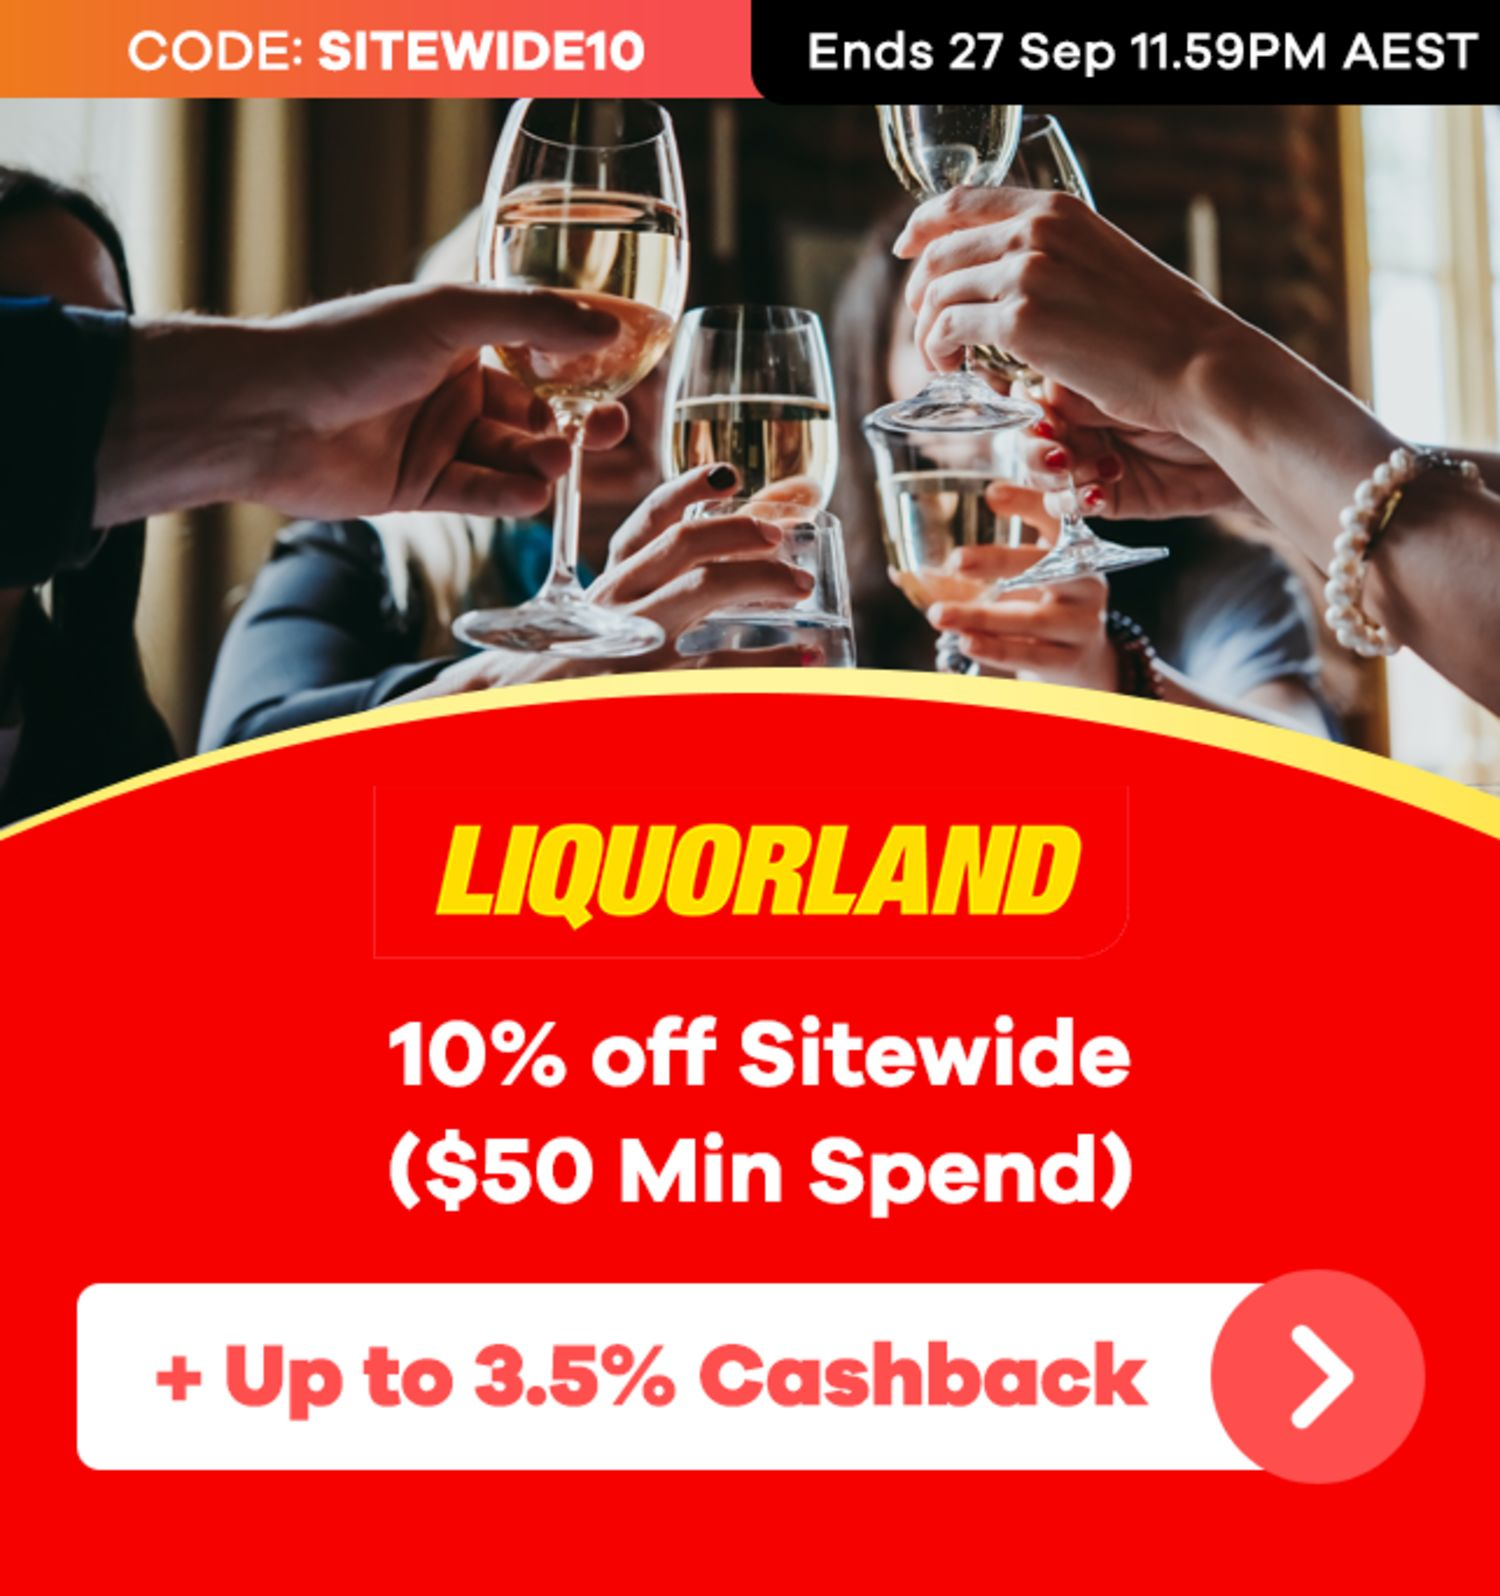 Liquorland - 10% off Sitewide